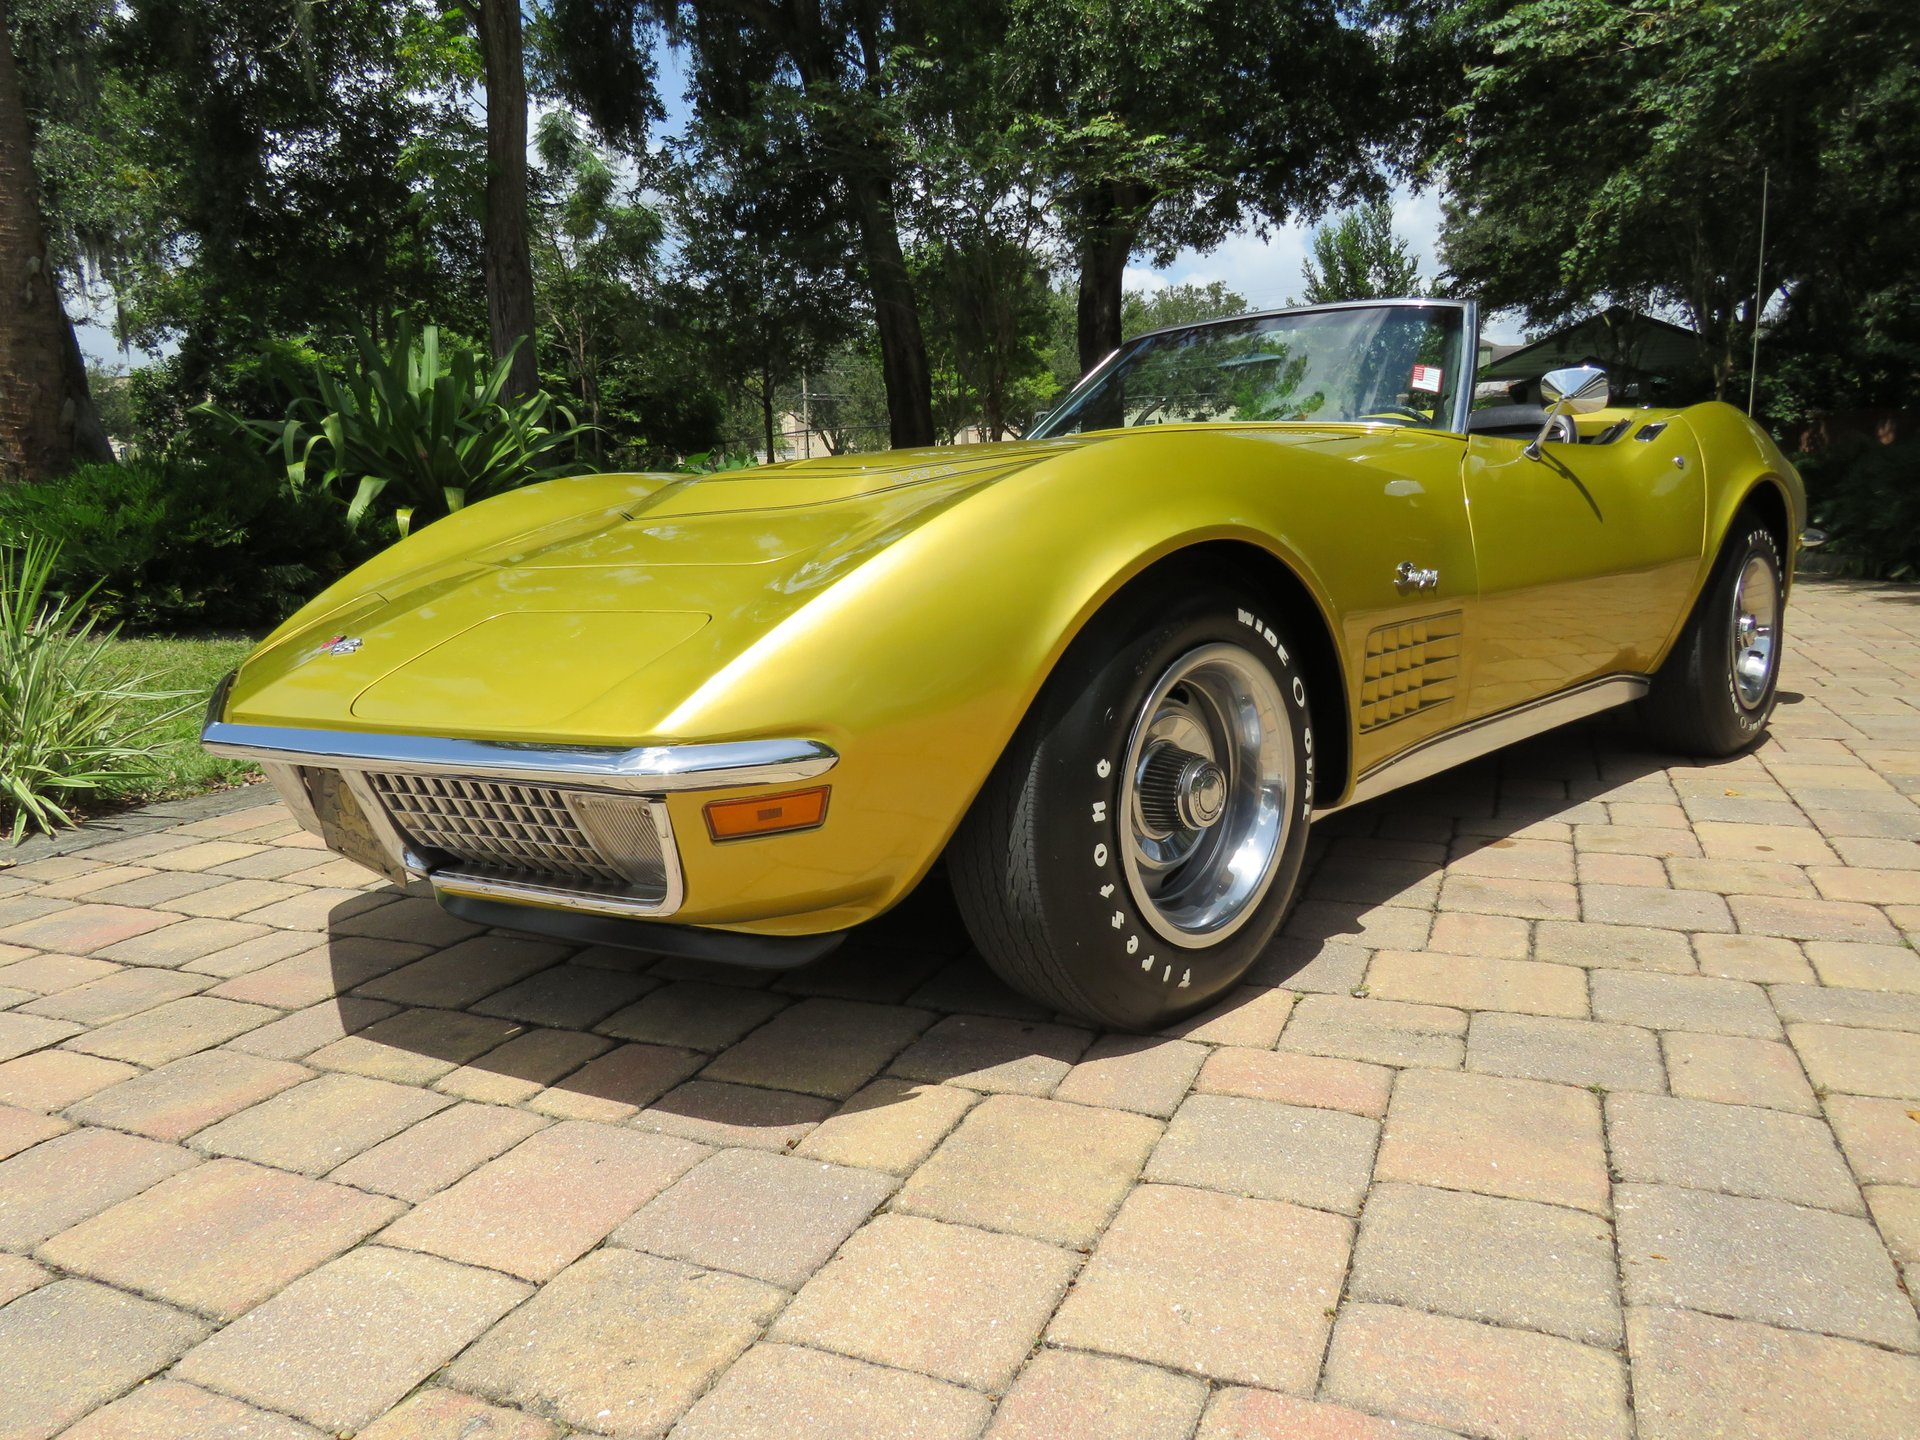 1971 chevrolet corvette lt1 convertible